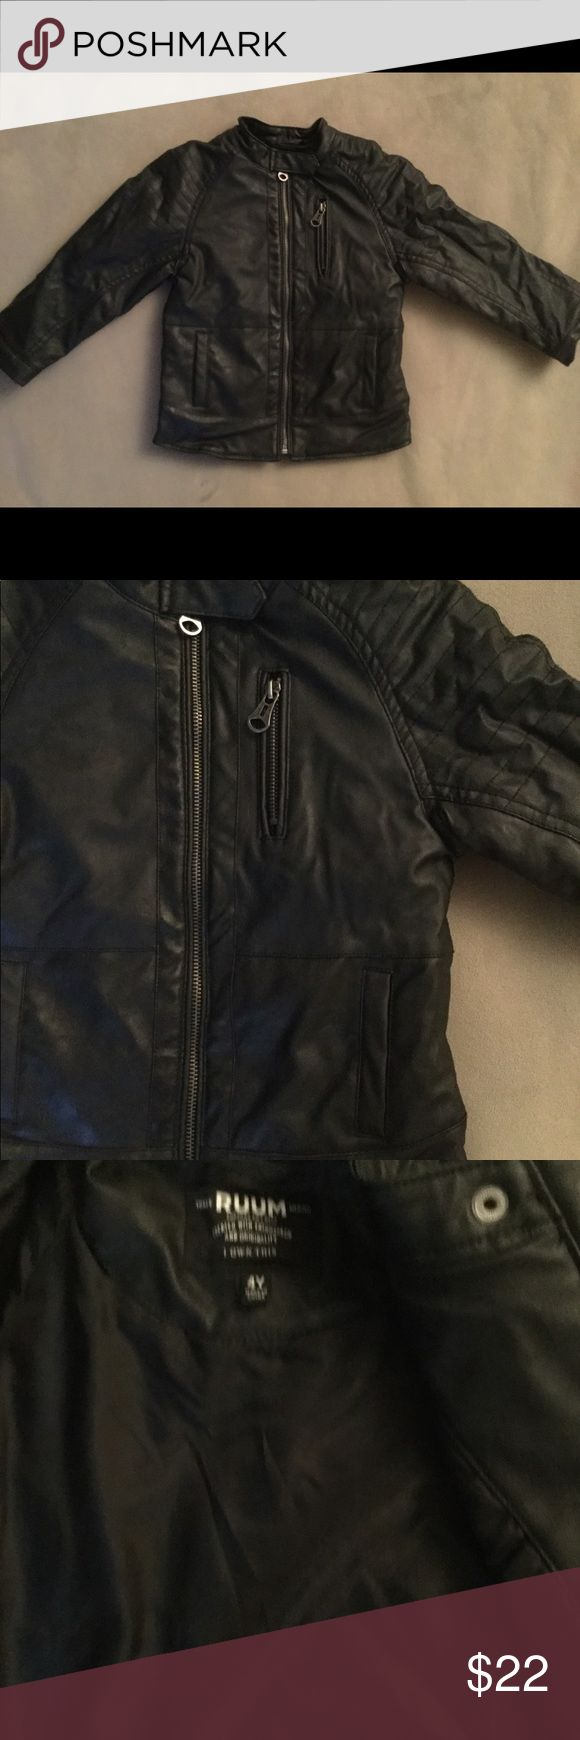 Ruum boys bomber jacket sz4 Ruum boys bomber jacket size 4. Faux leather. Black in color. Zip up front. Ruum Jackets & Coats